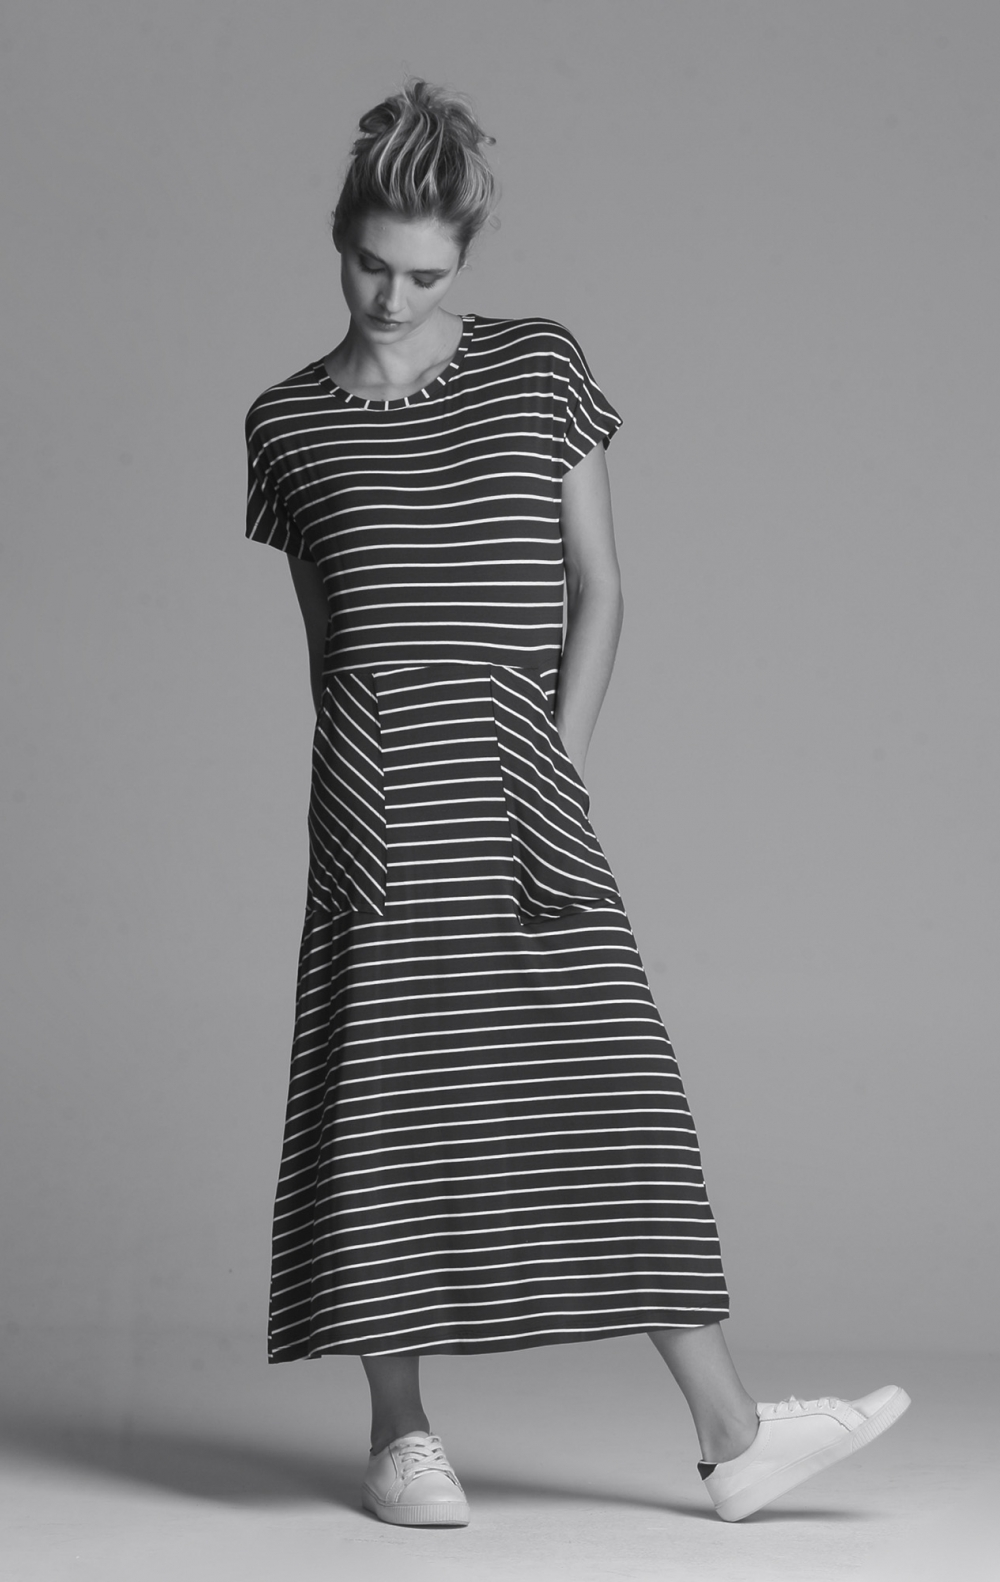 Vestido Malha Listras Marinho - Foto 1